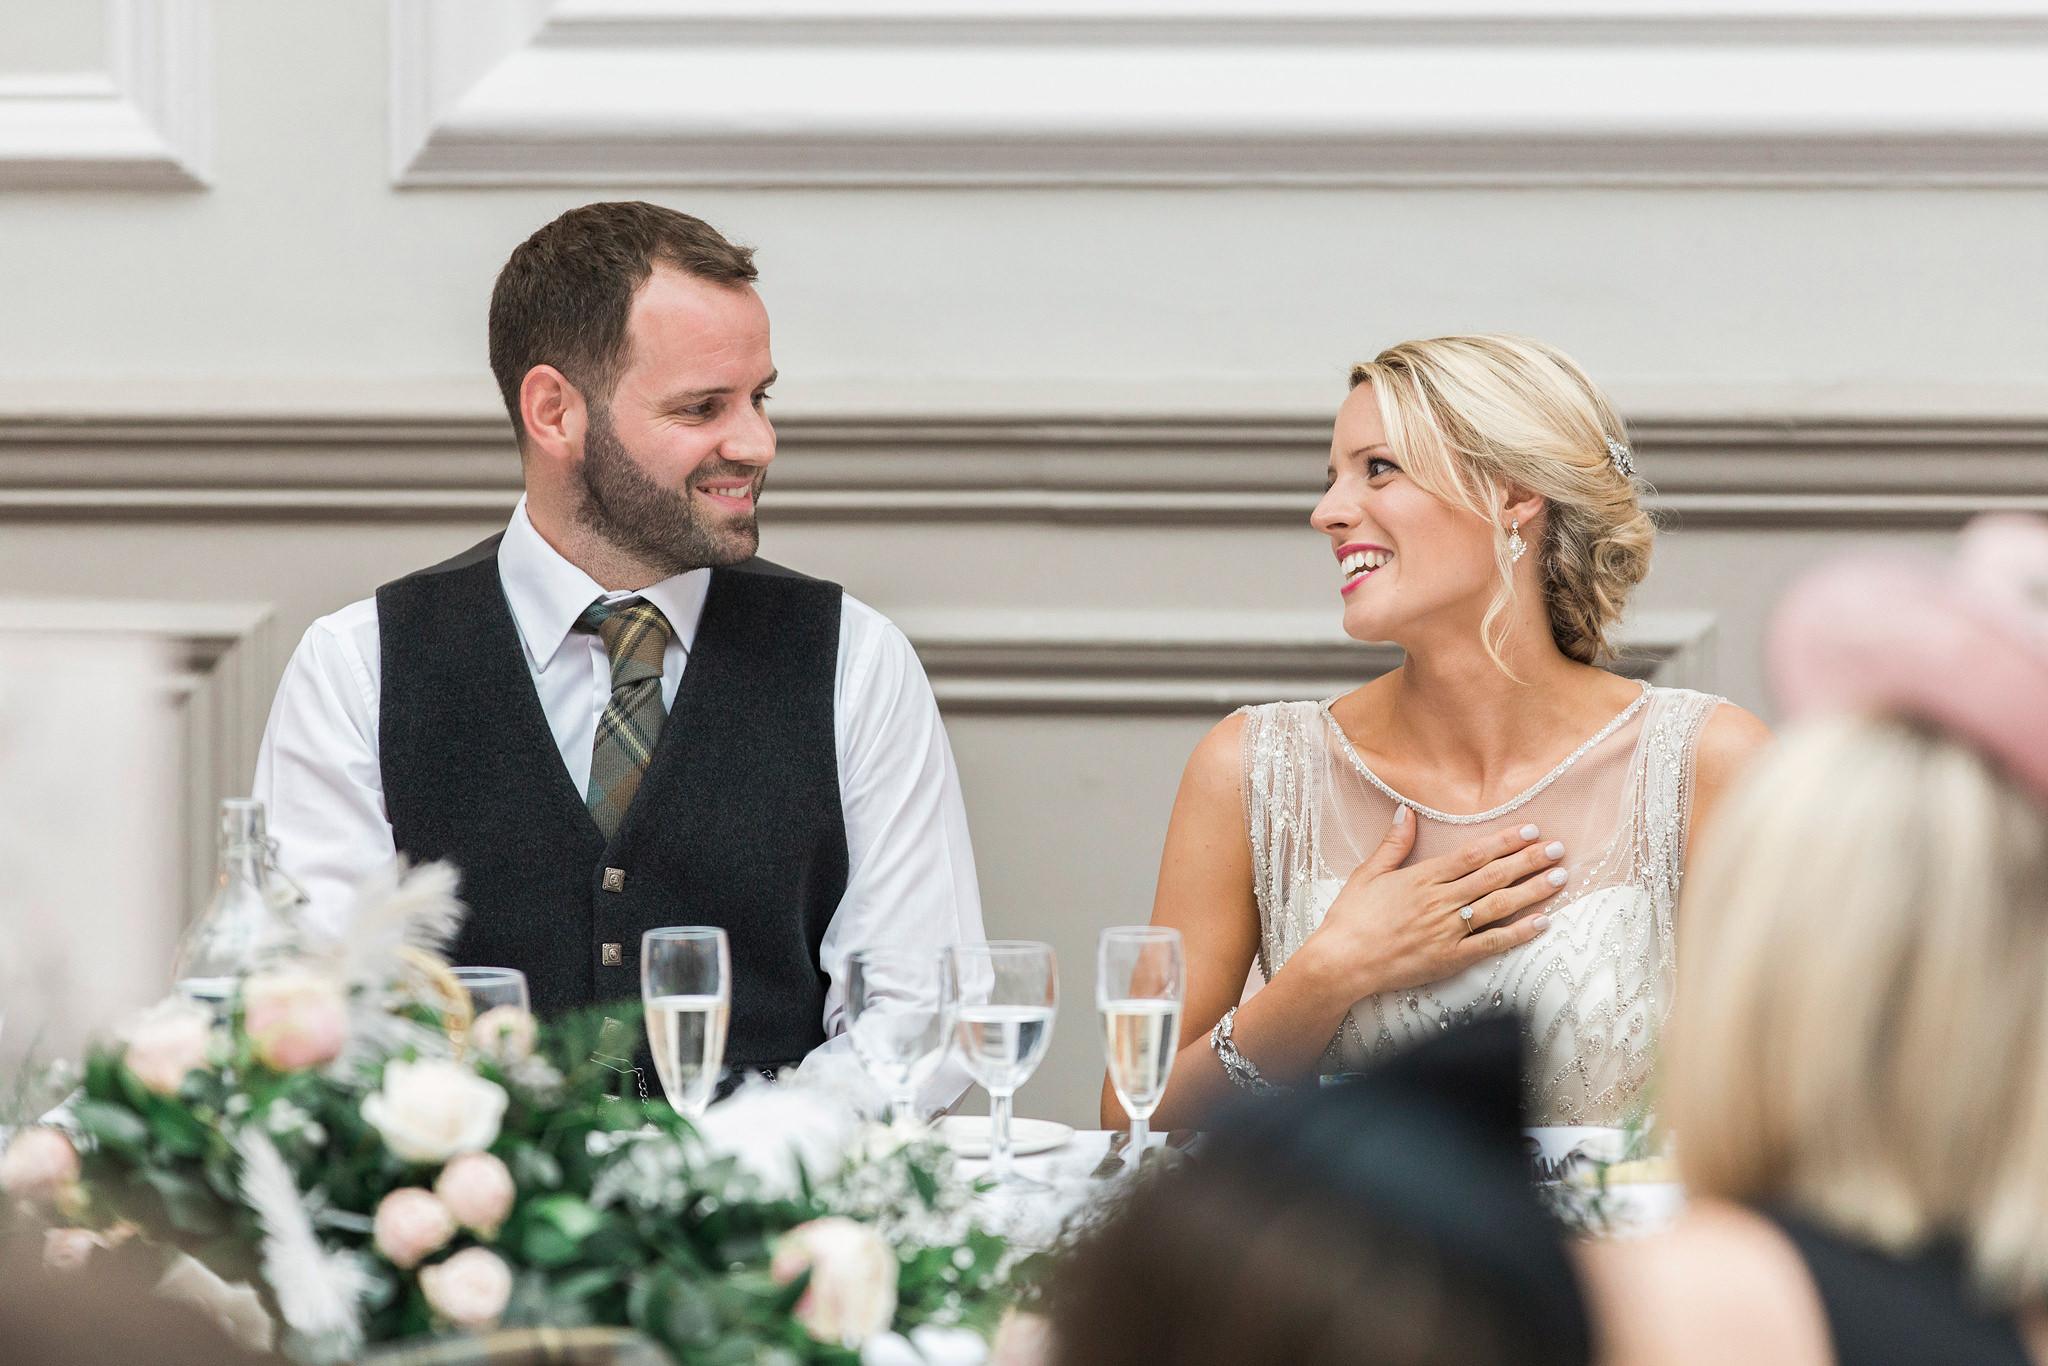 108-destination-wedding-photography.jpg